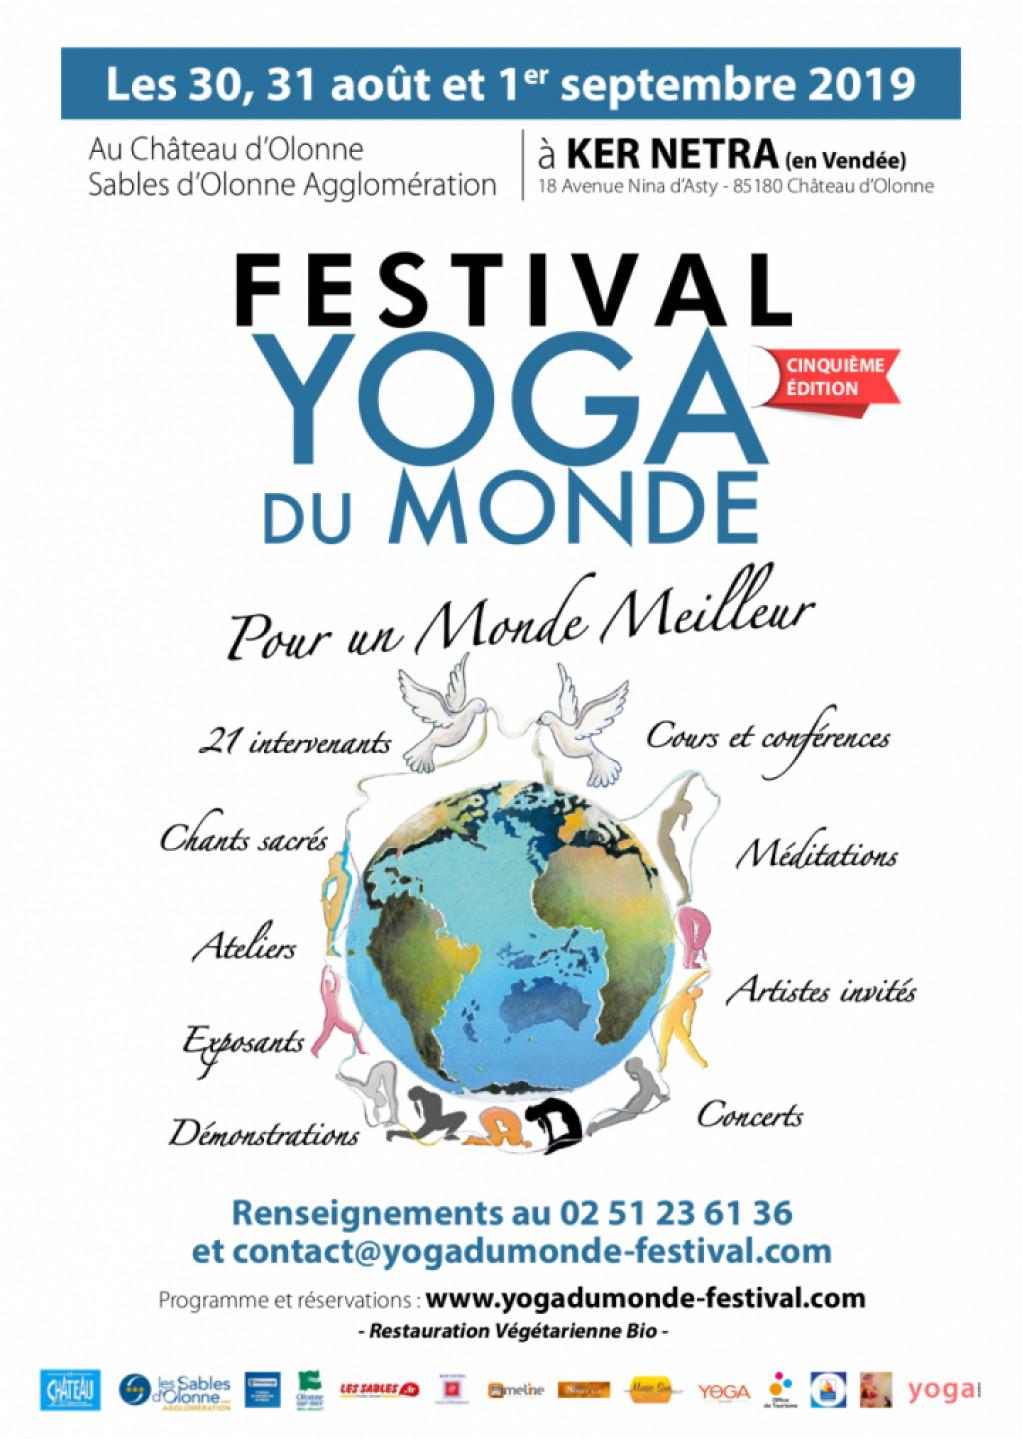 FESTIVAL YOGA DU MONDE 2019